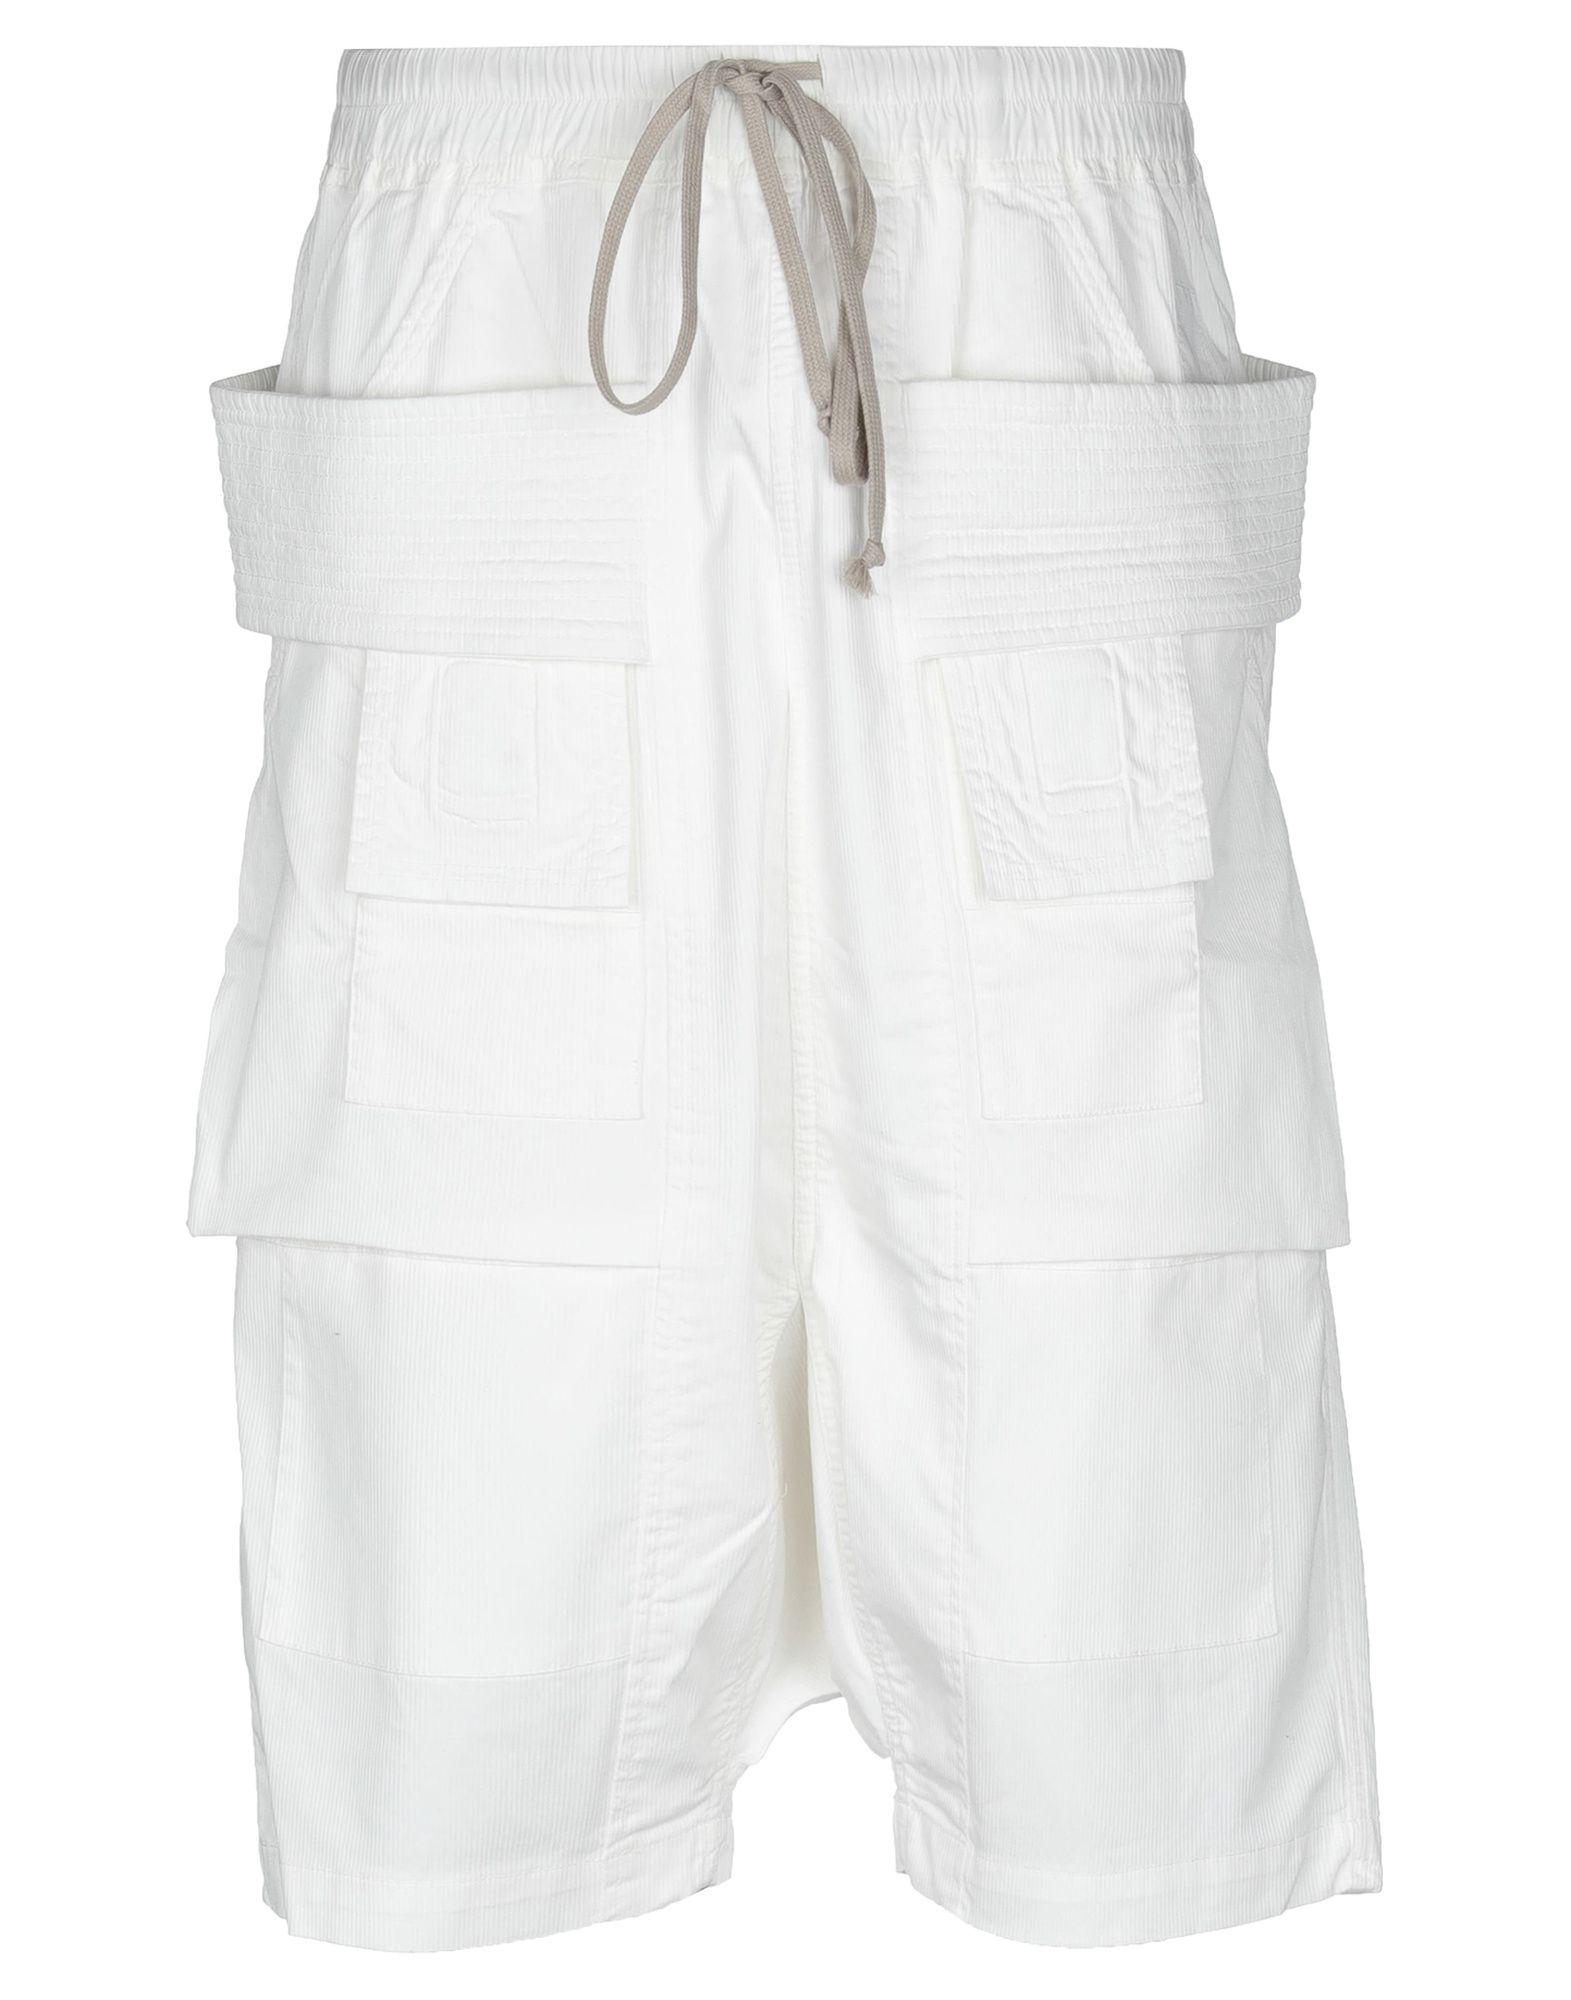 Shorts & Bermuda Drkshdw By Rick Owens herren - 36959588JA